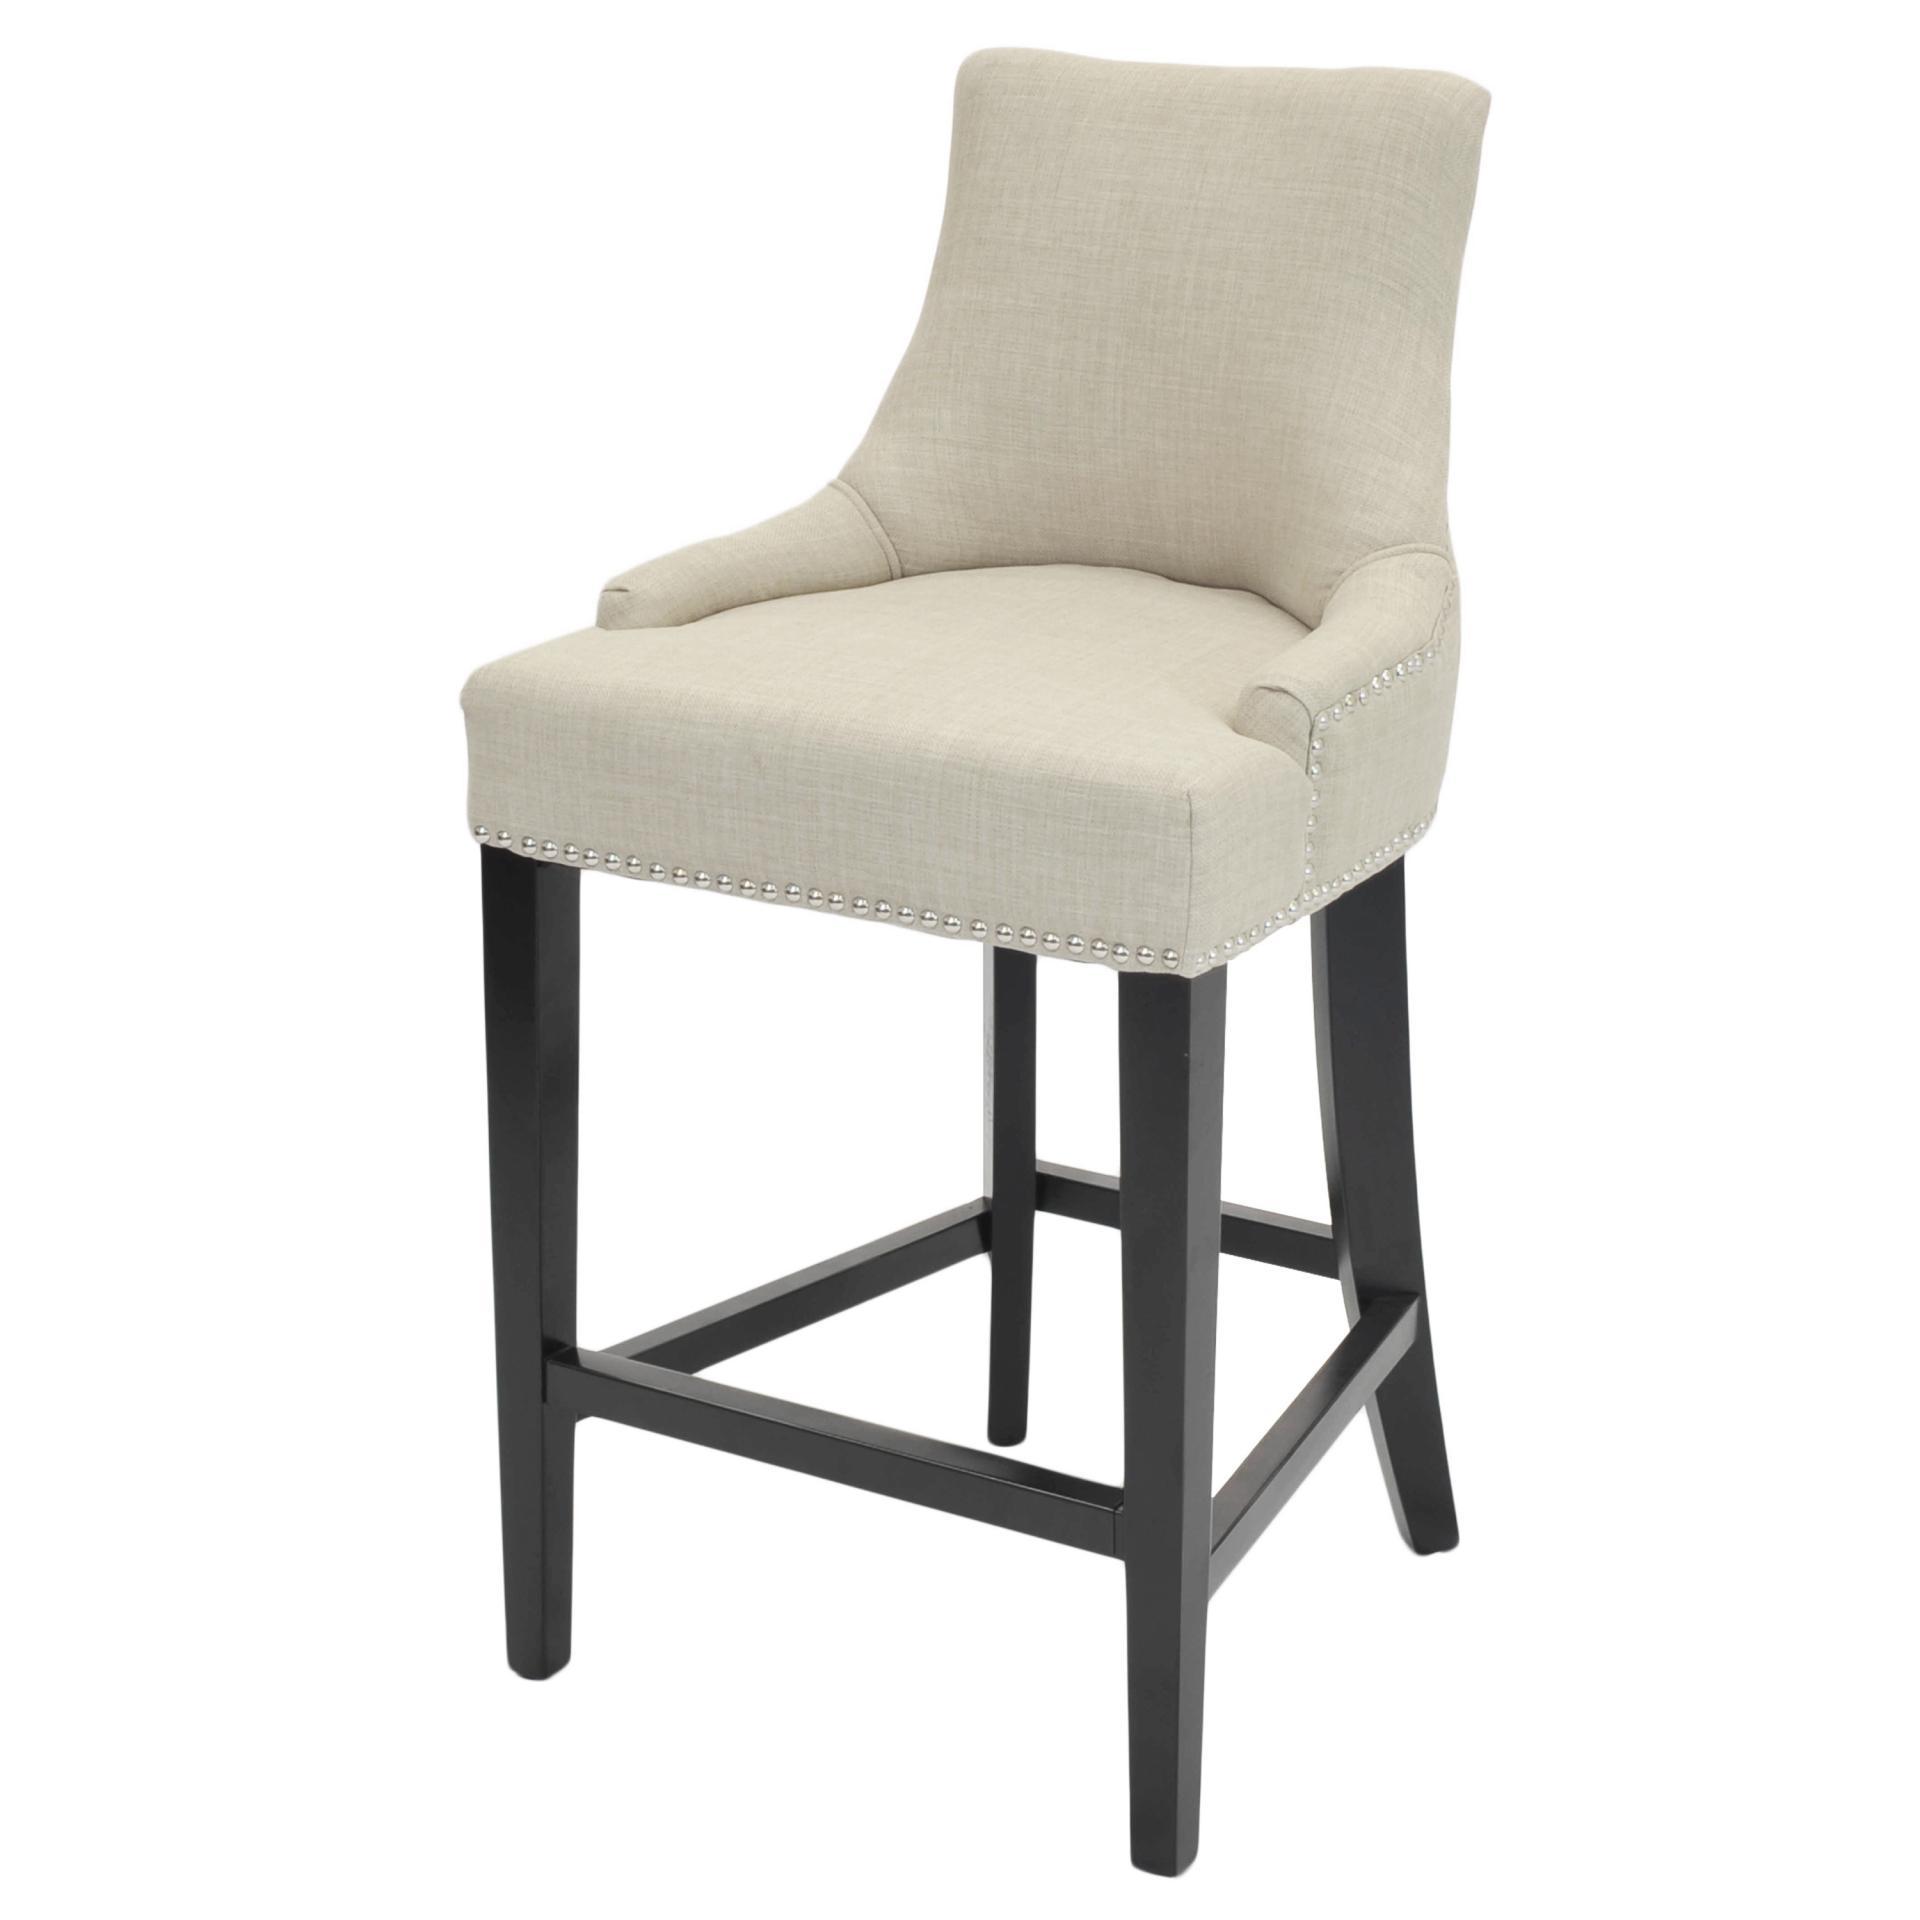 108526 Hs03 Npd Furniture Stylish Amp Affordable